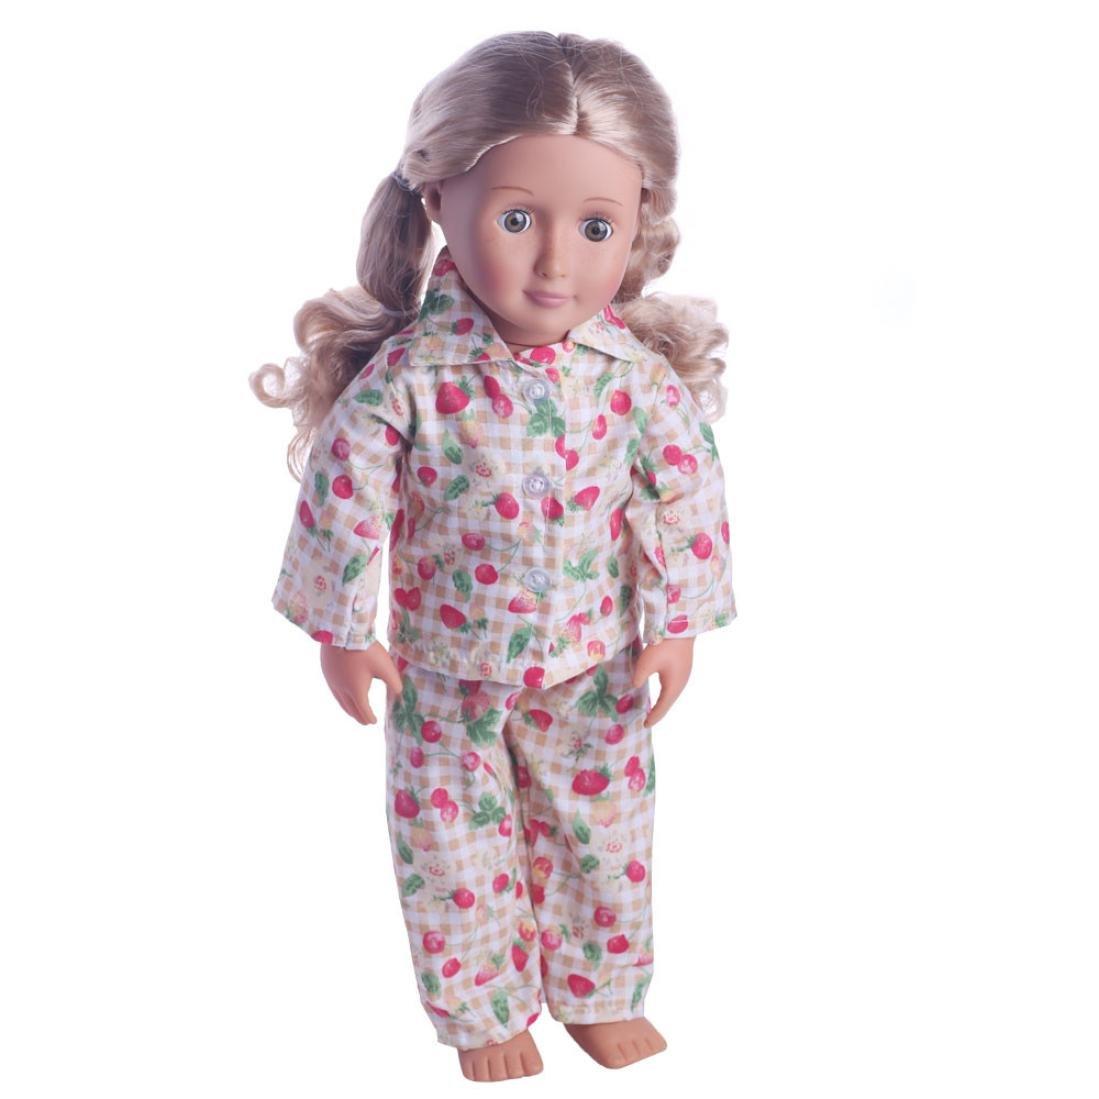 2 Stück Pyjamas, Süße Nachthemd Kleidung für American Girl Puppe 18 ...